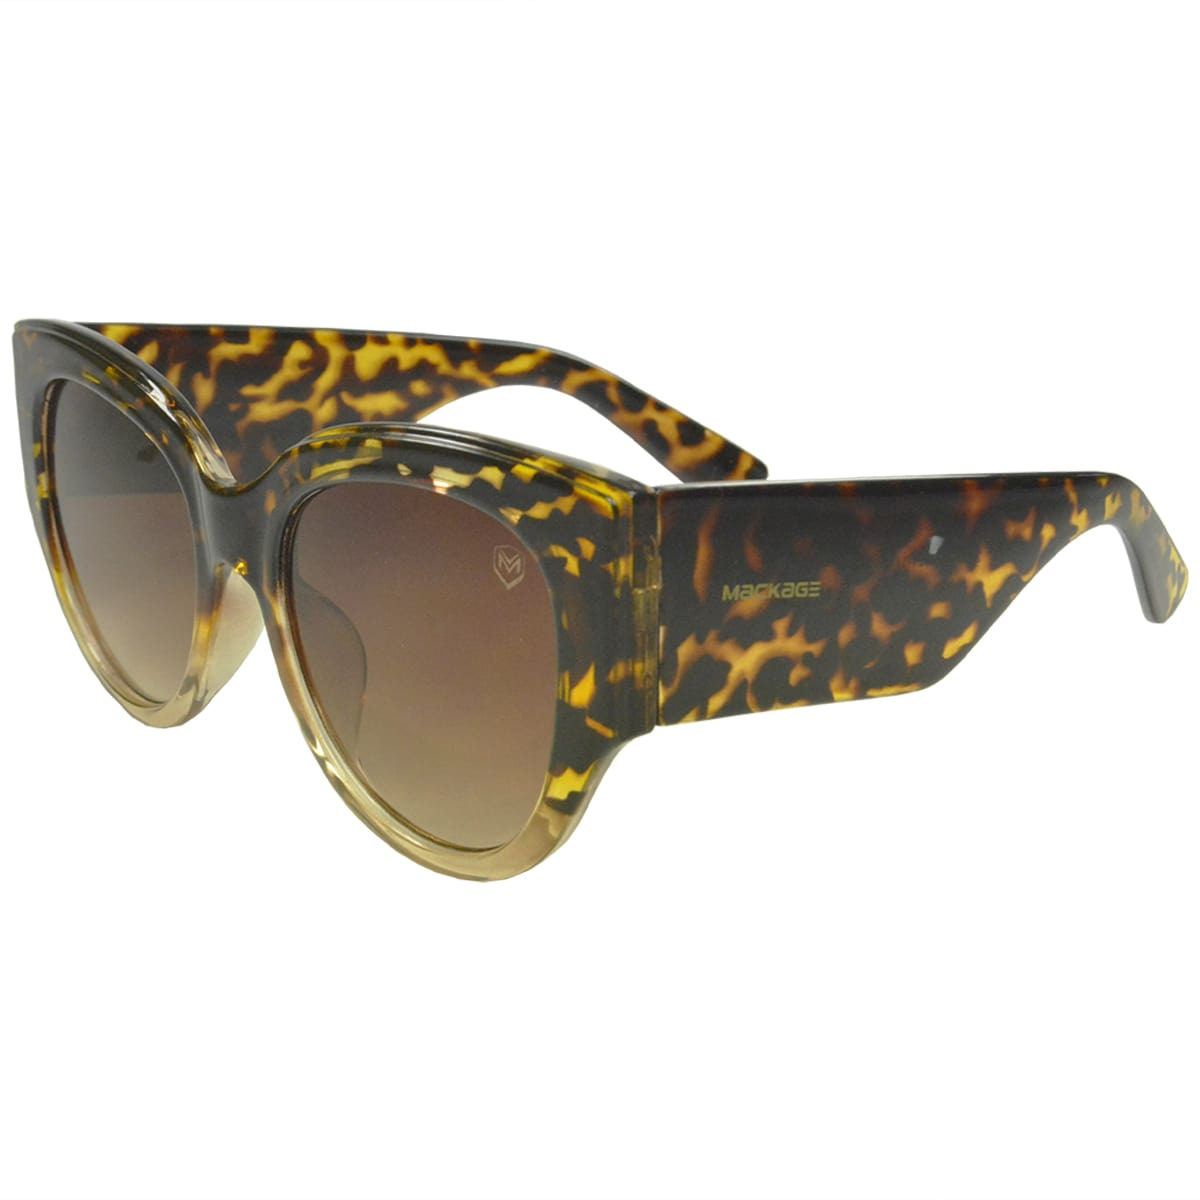 Óculos de Sol Mackage MK28306LN Tarta ou Marrom